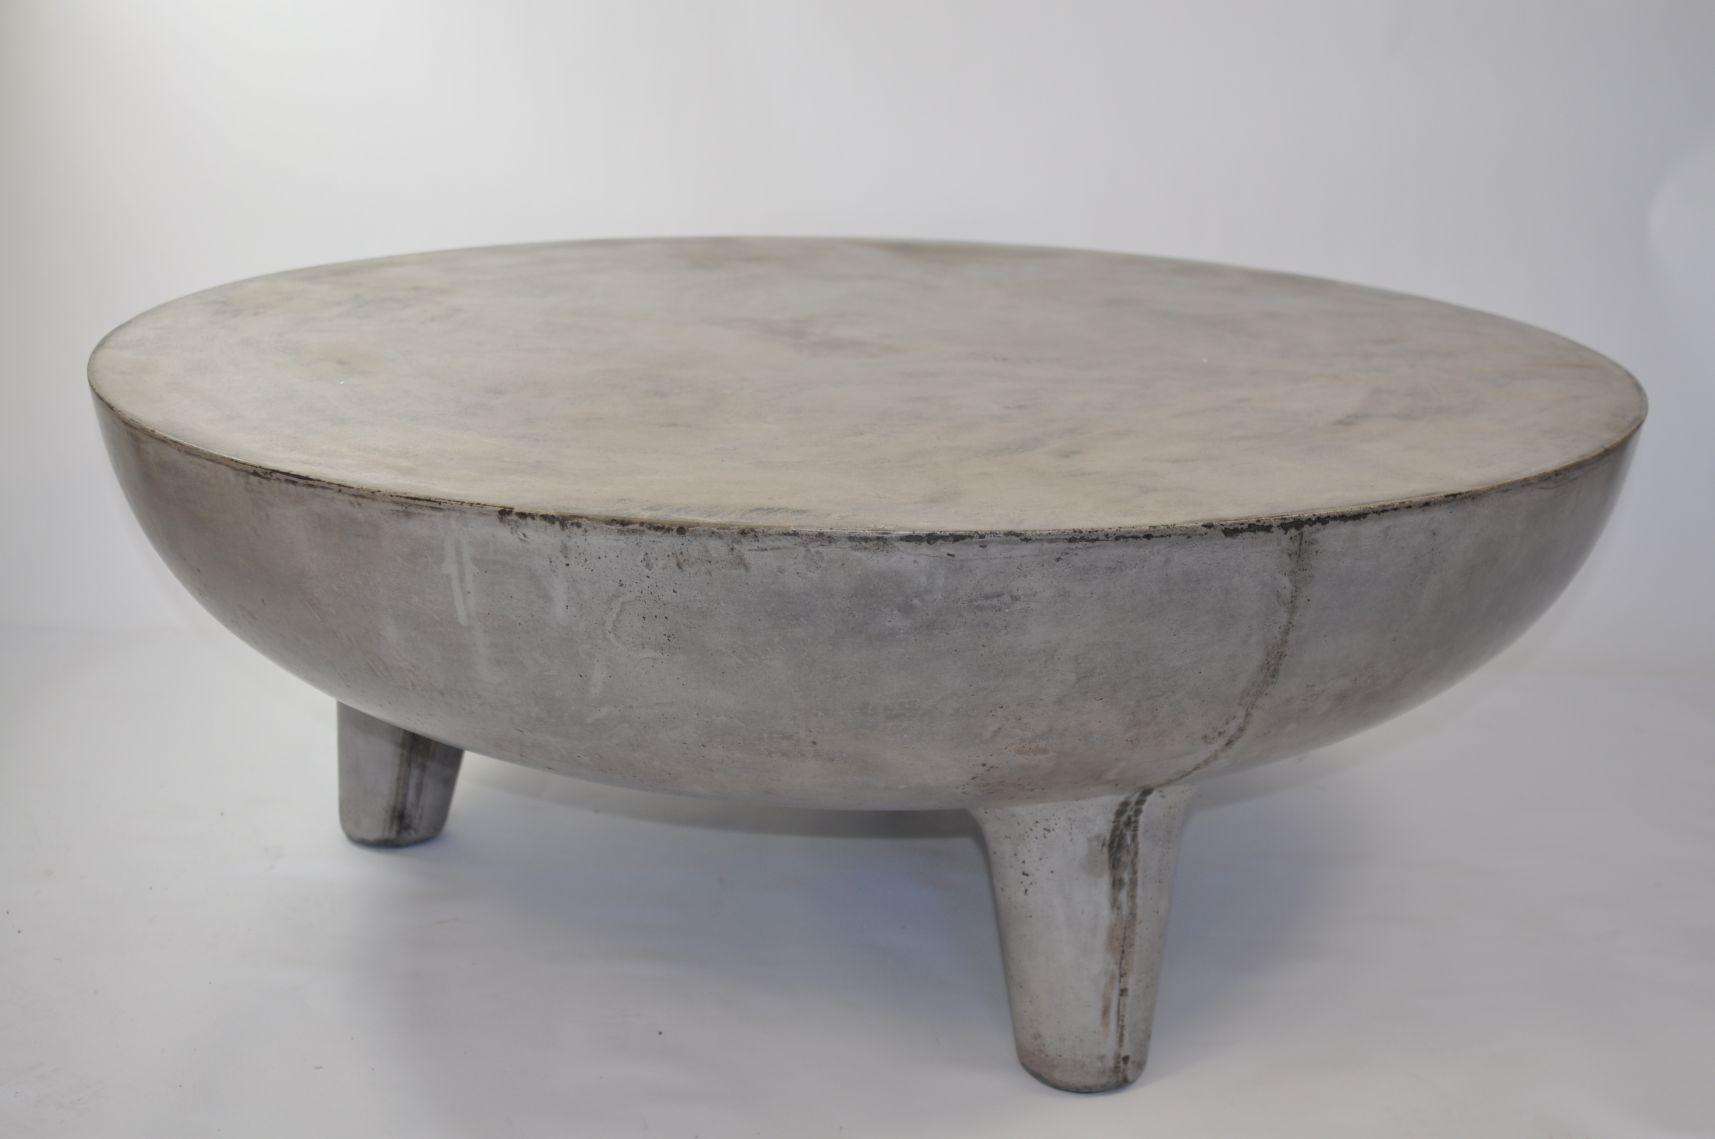 Greer Light Concrete Coffee Table Mecox Gardens Round Coffee Table Diy Coffee Table Diy Coffee Table [ 1139 x 1715 Pixel ]